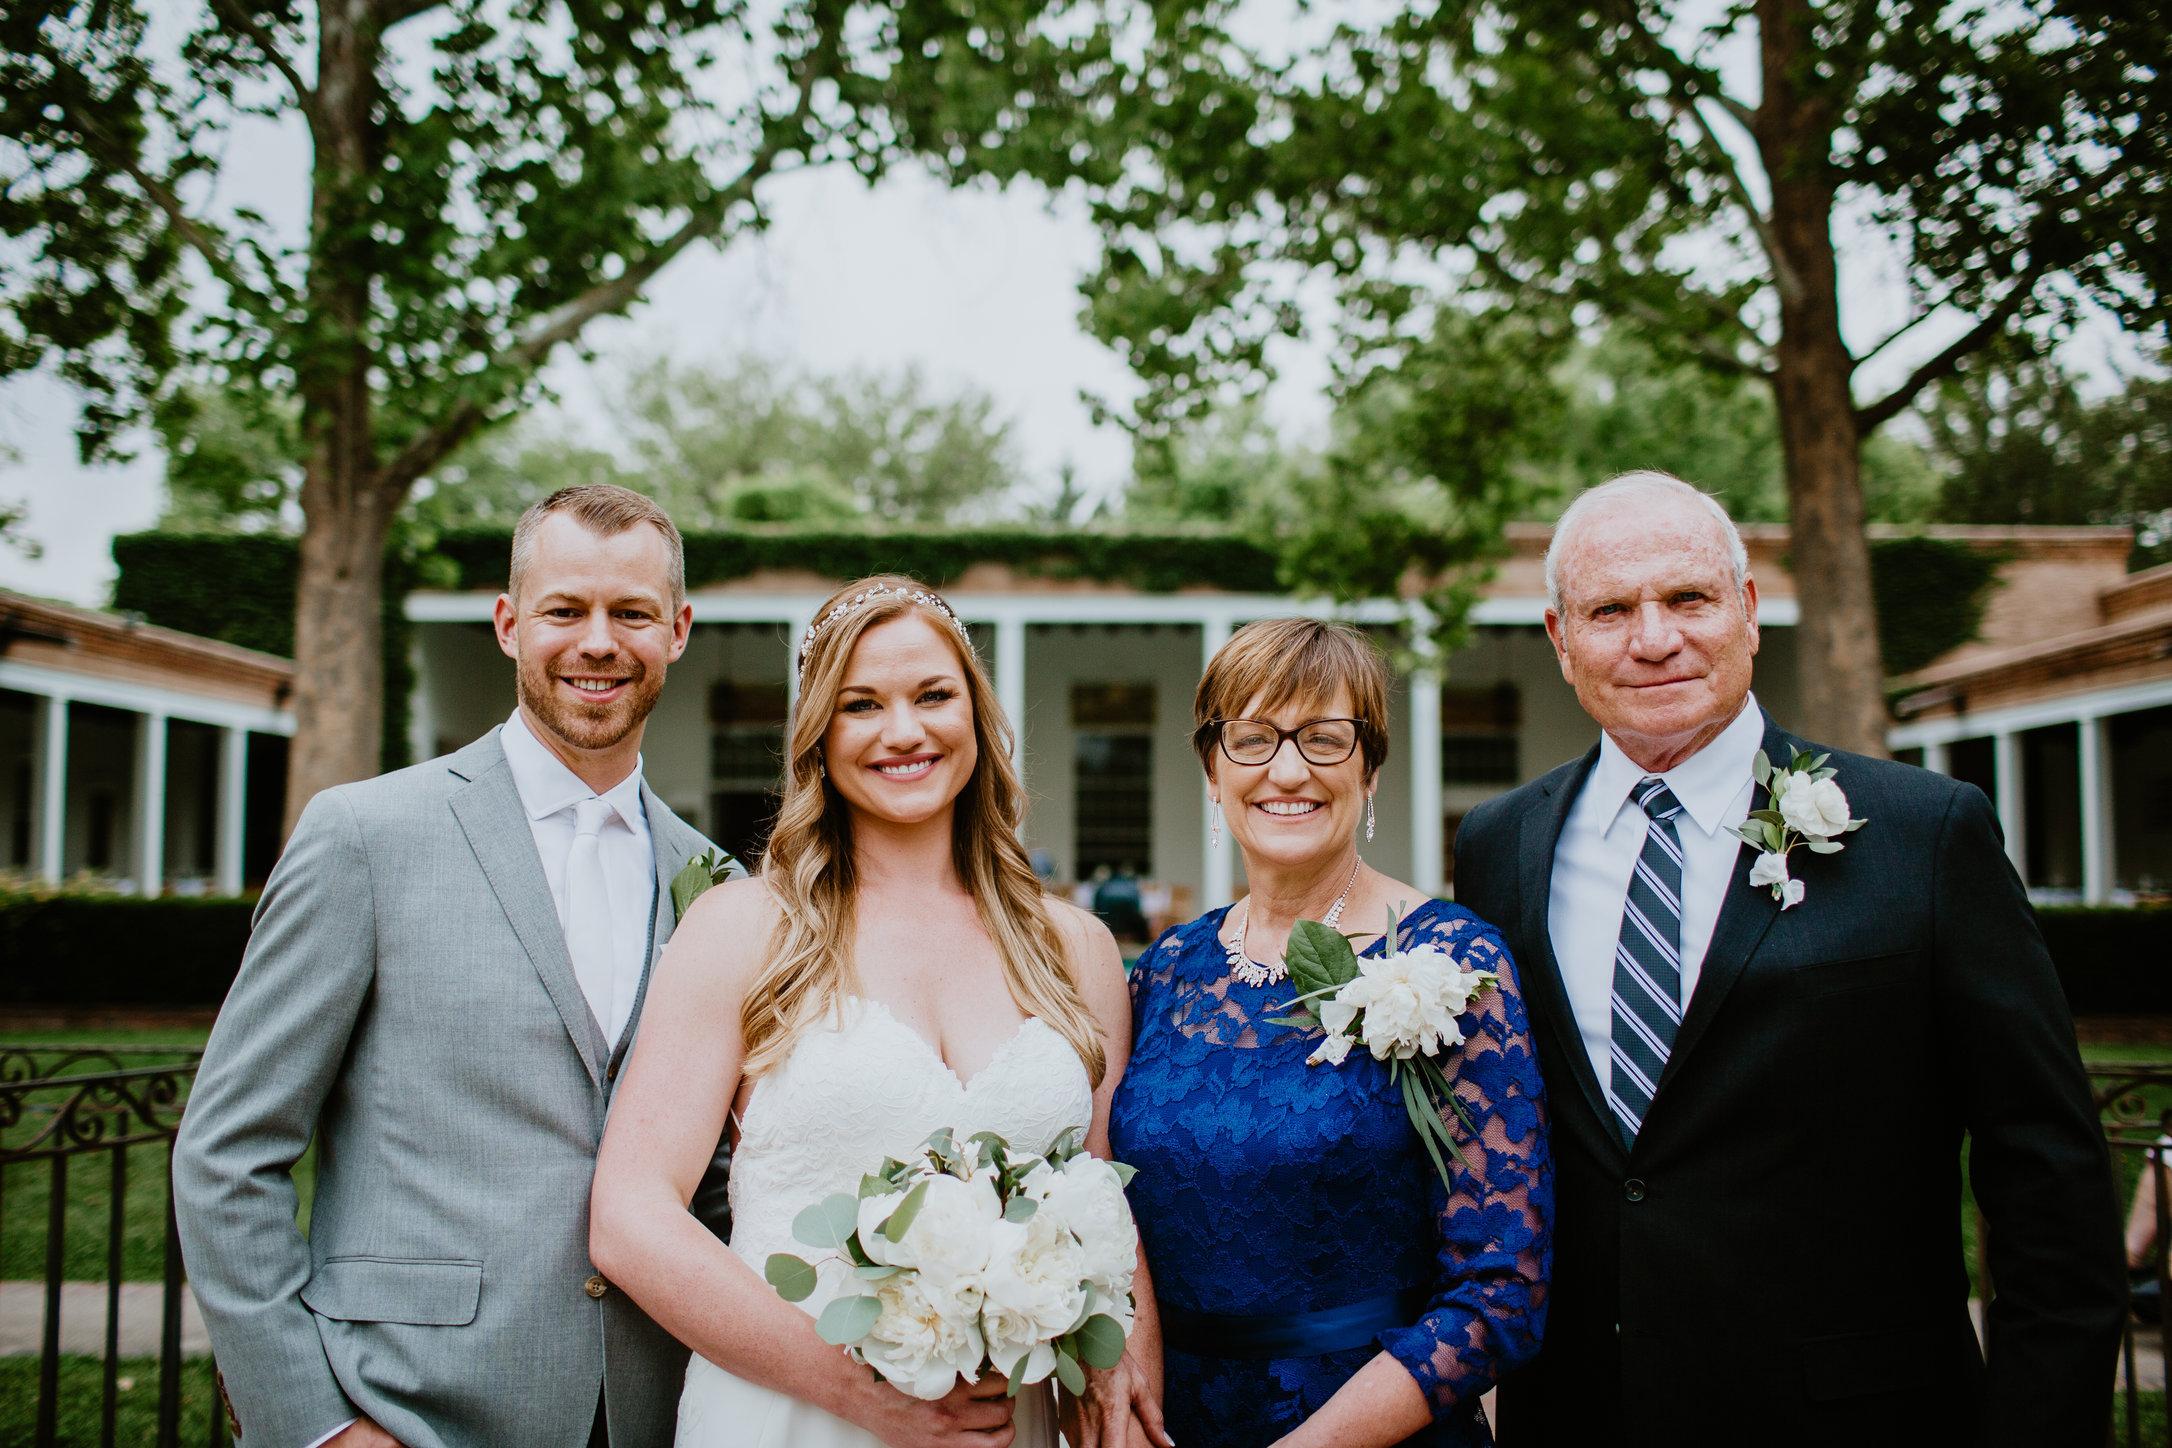 DandA-wedding-461.jpg